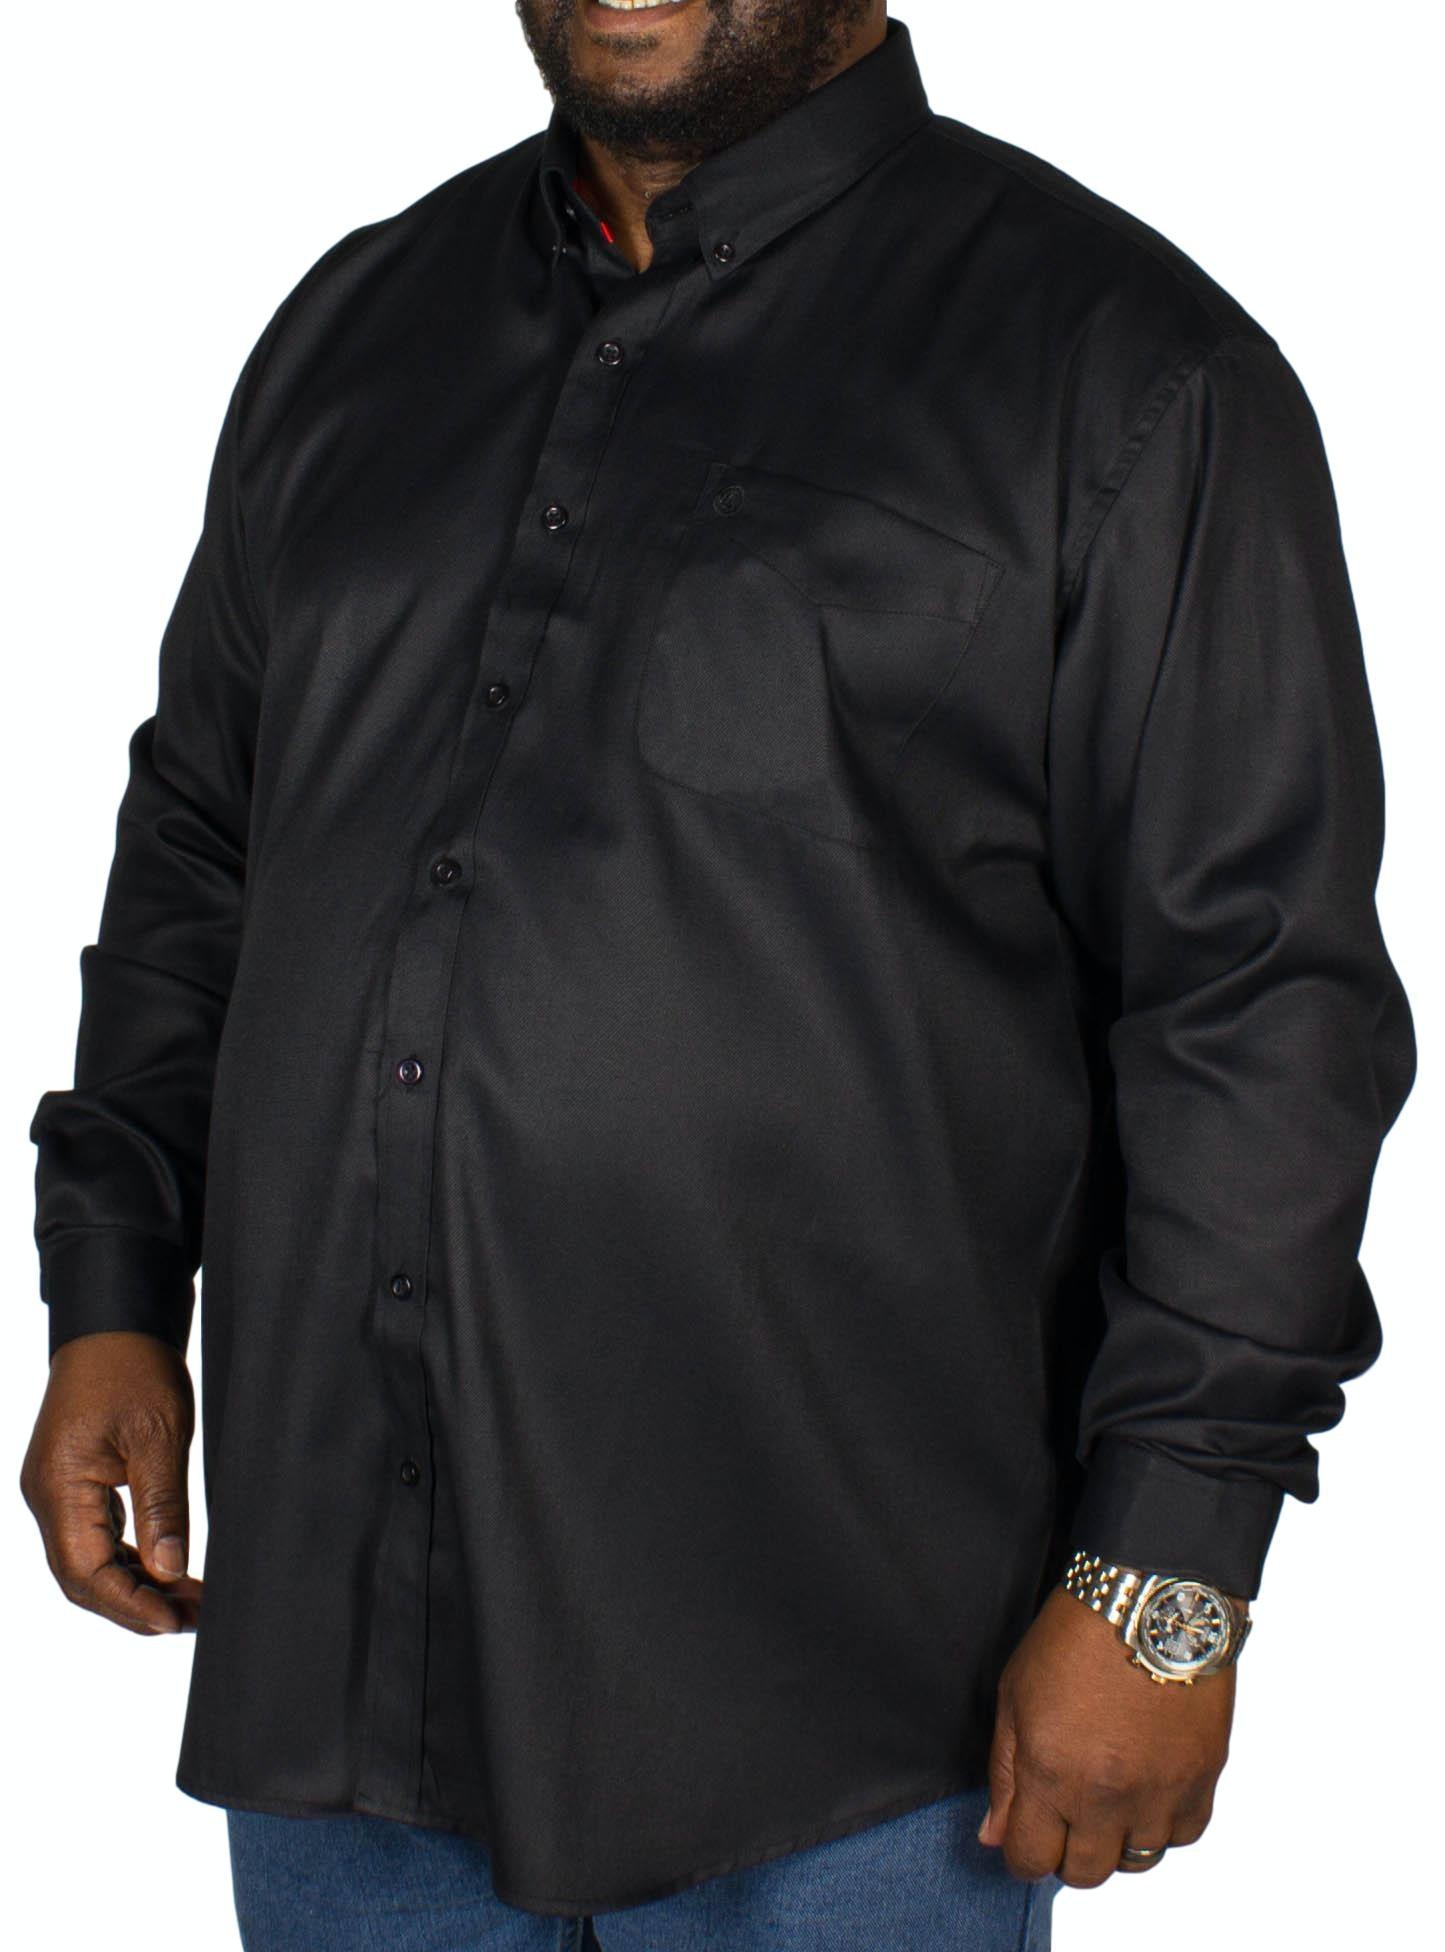 Espionage Oxford Long Sleeve Shirt Black